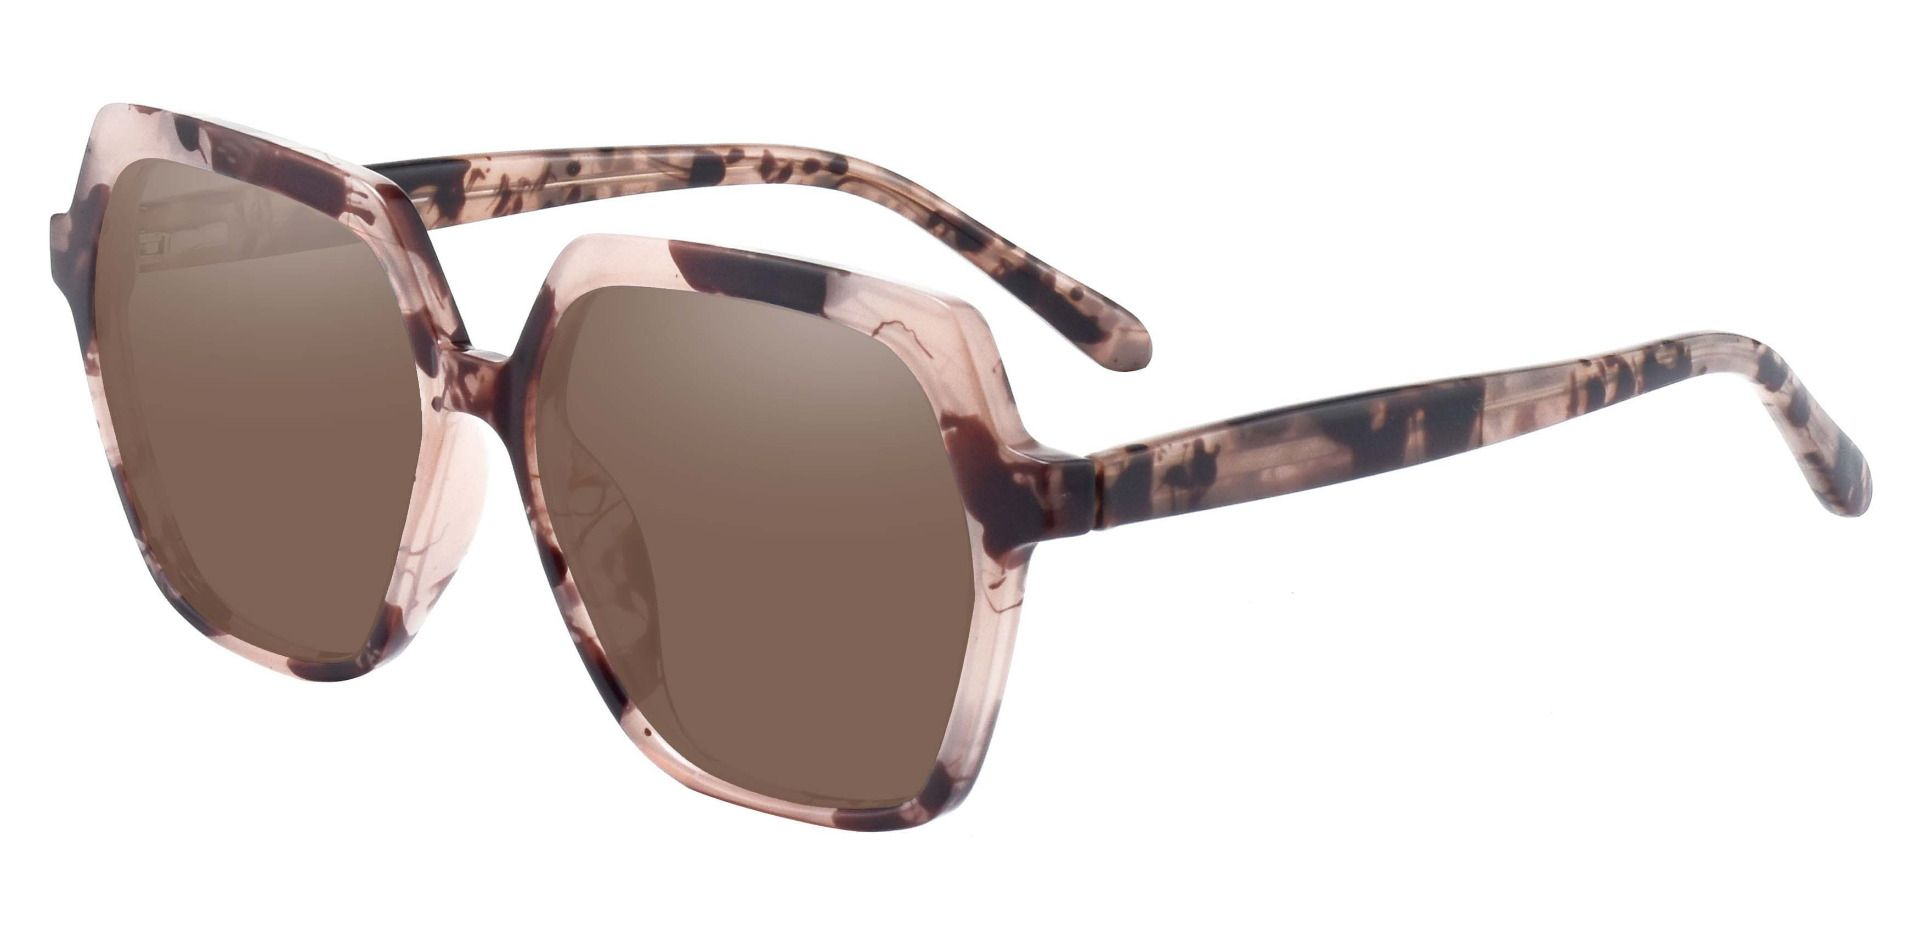 Regent Geometric Non-Rx Sunglasses - Tortoise Frame With Brown Lenses